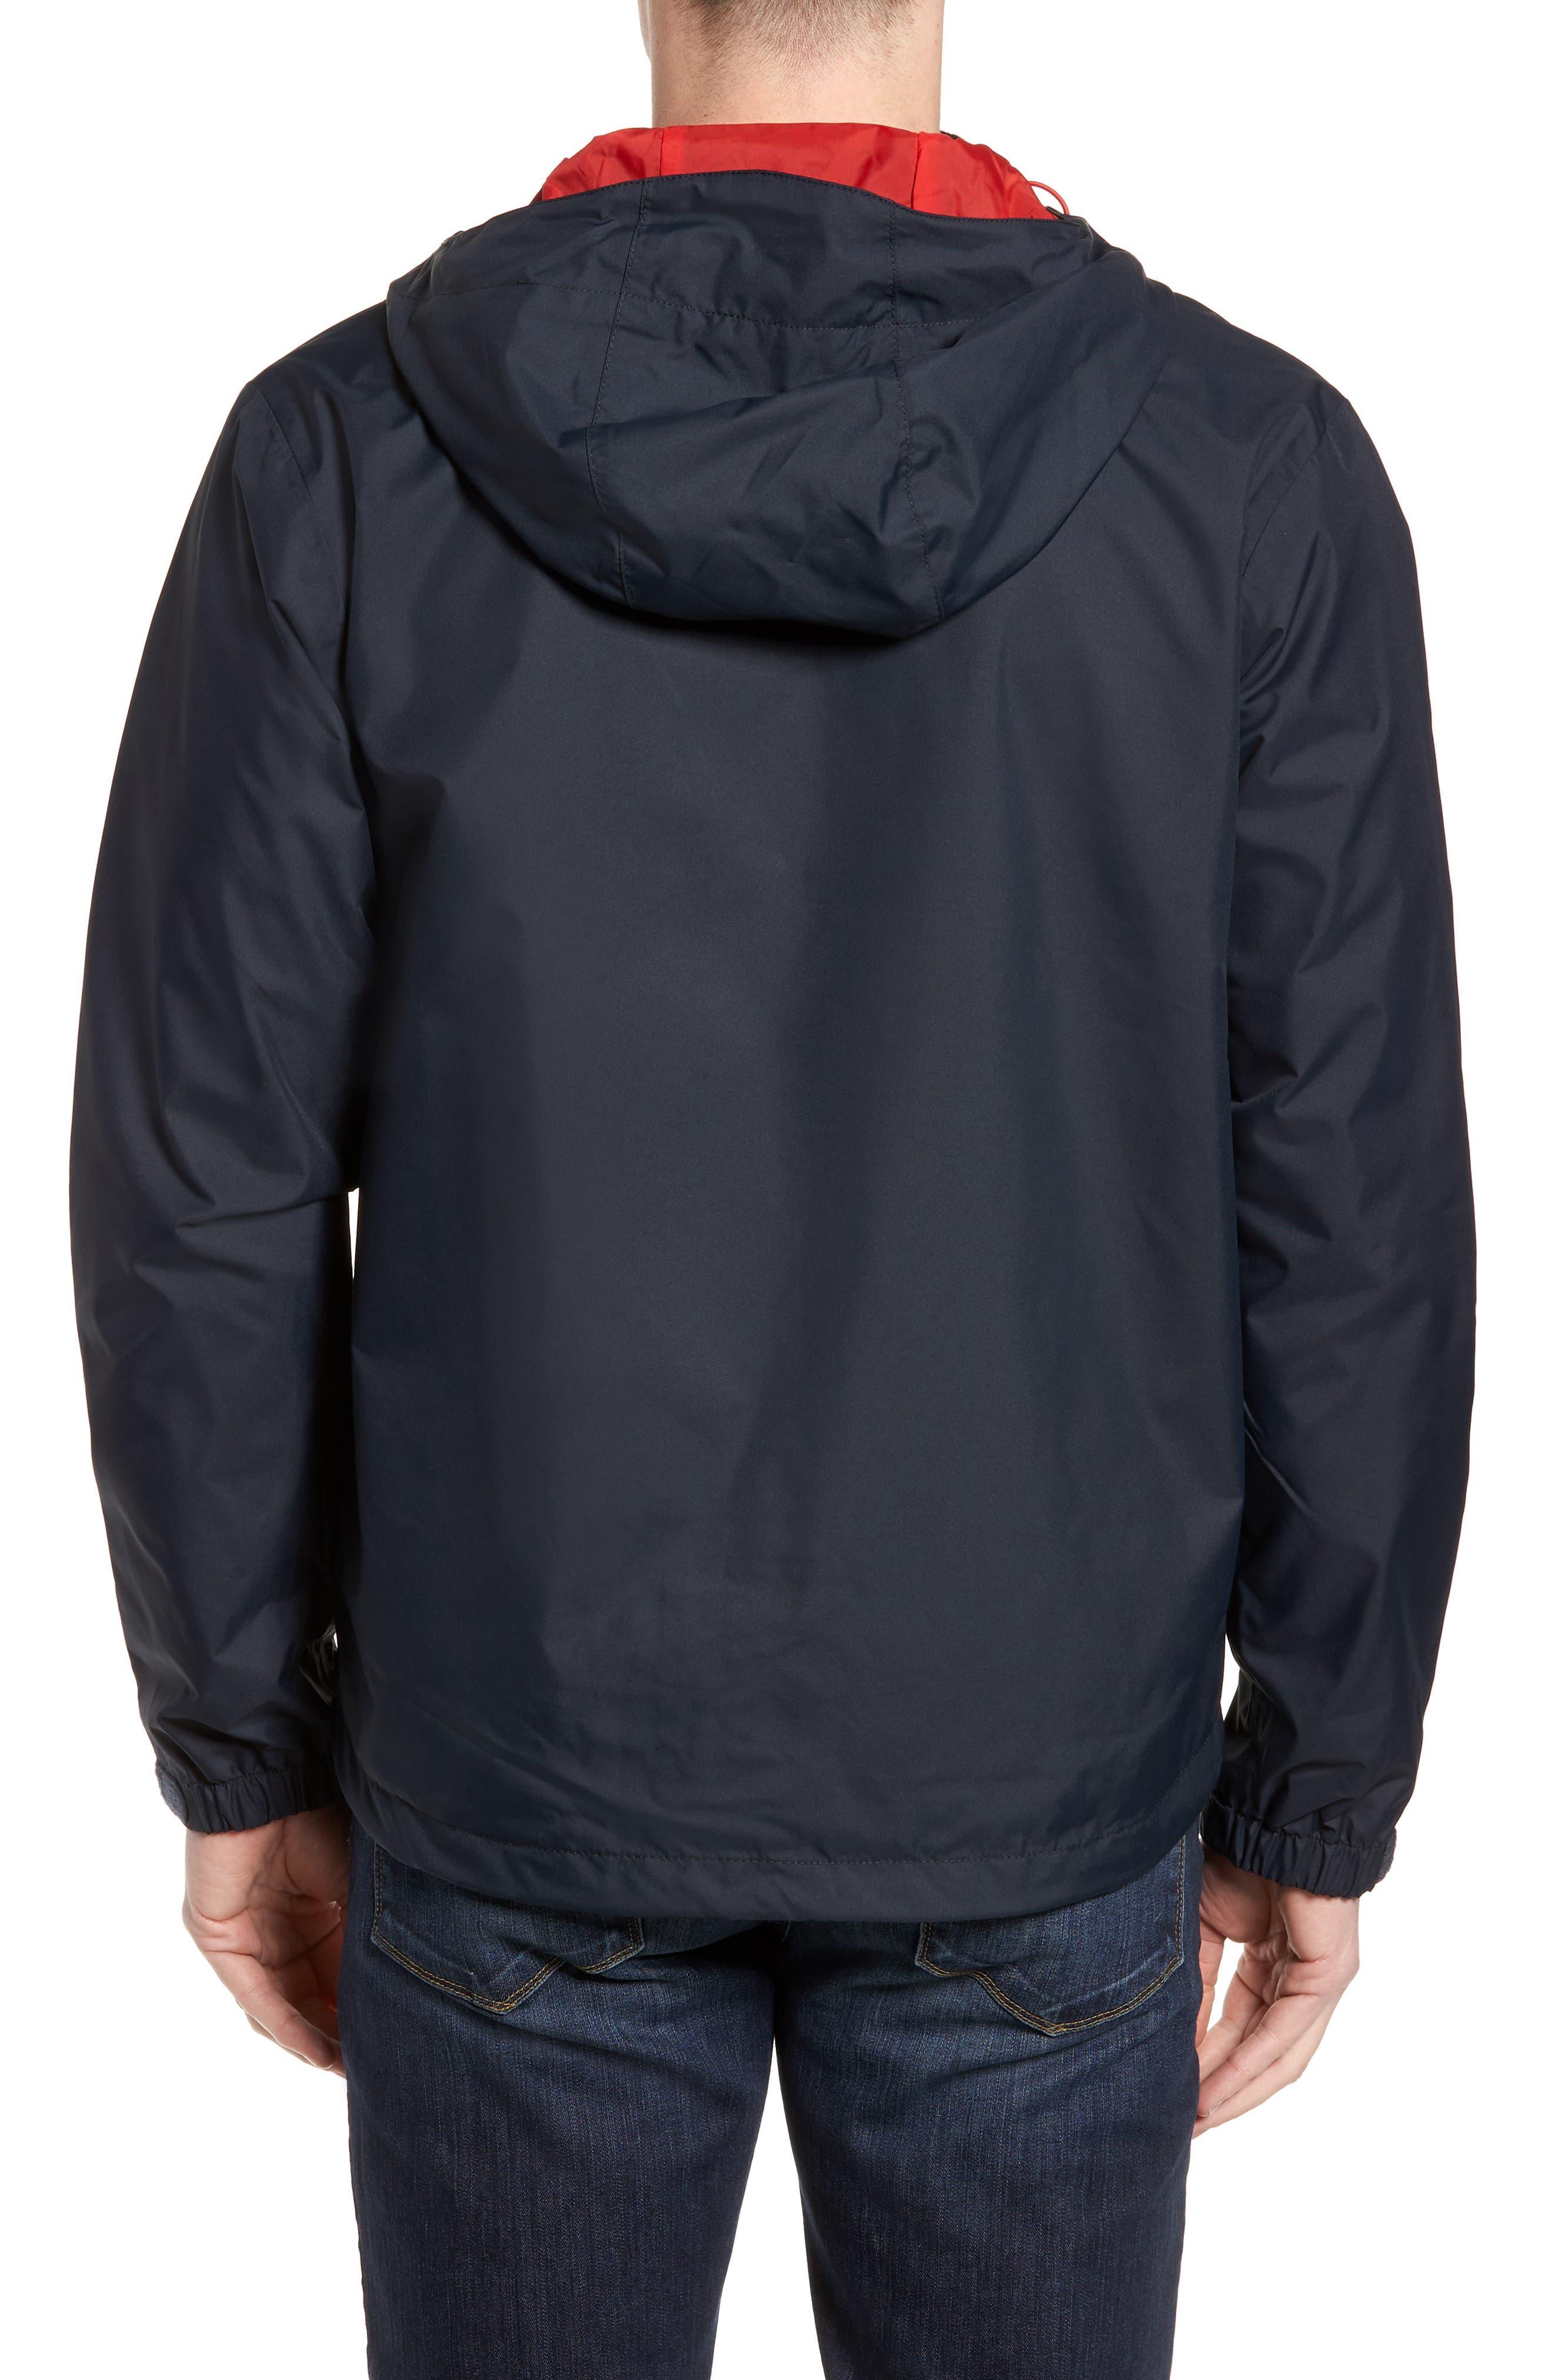 'Vancouver' Packable Rain Jacket,                             Alternate thumbnail 2, color,                             Navy/ Navy